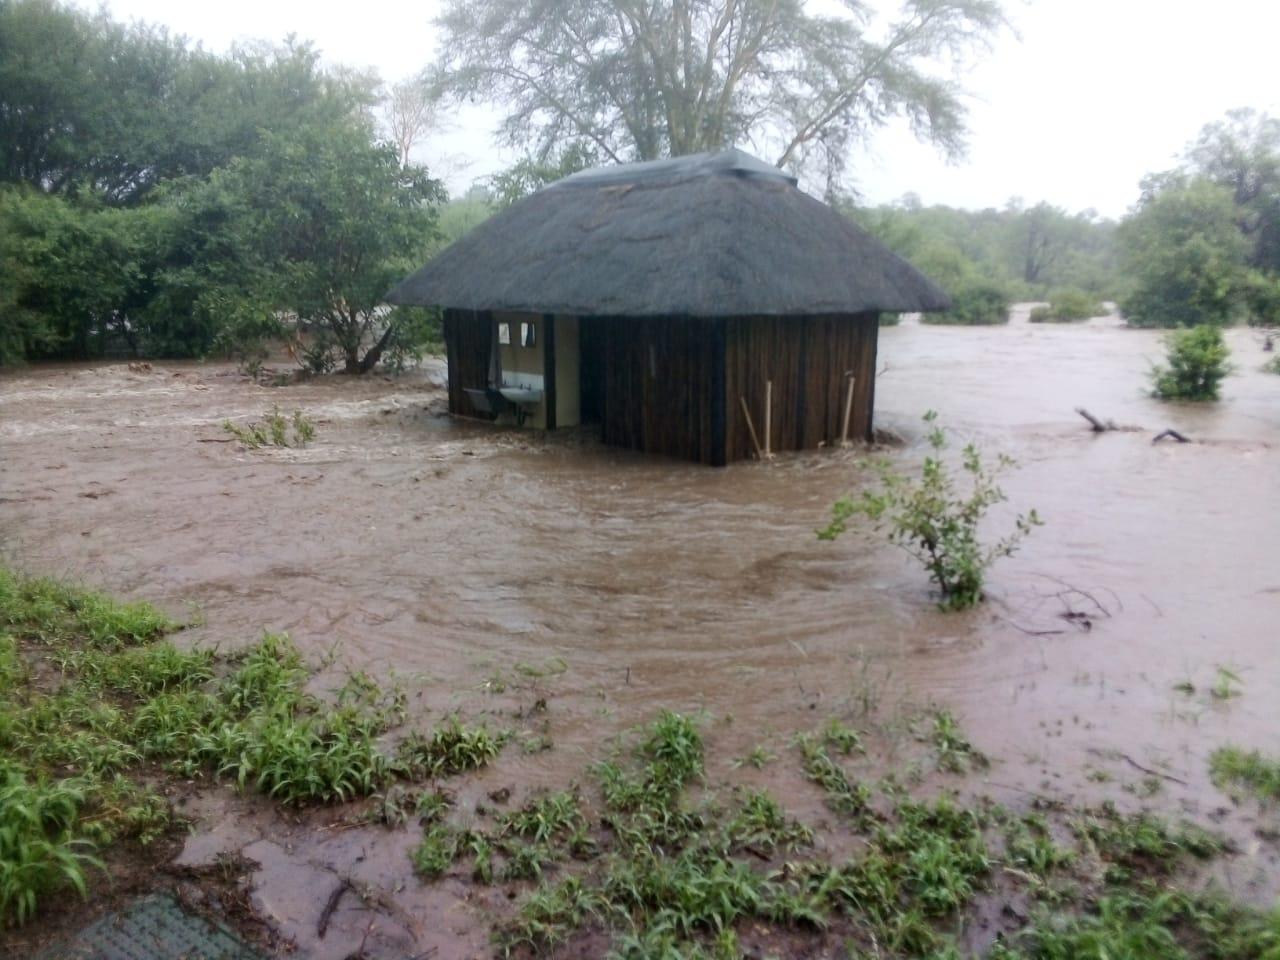 nyalaland kruger national park south africa heavy rains flooding